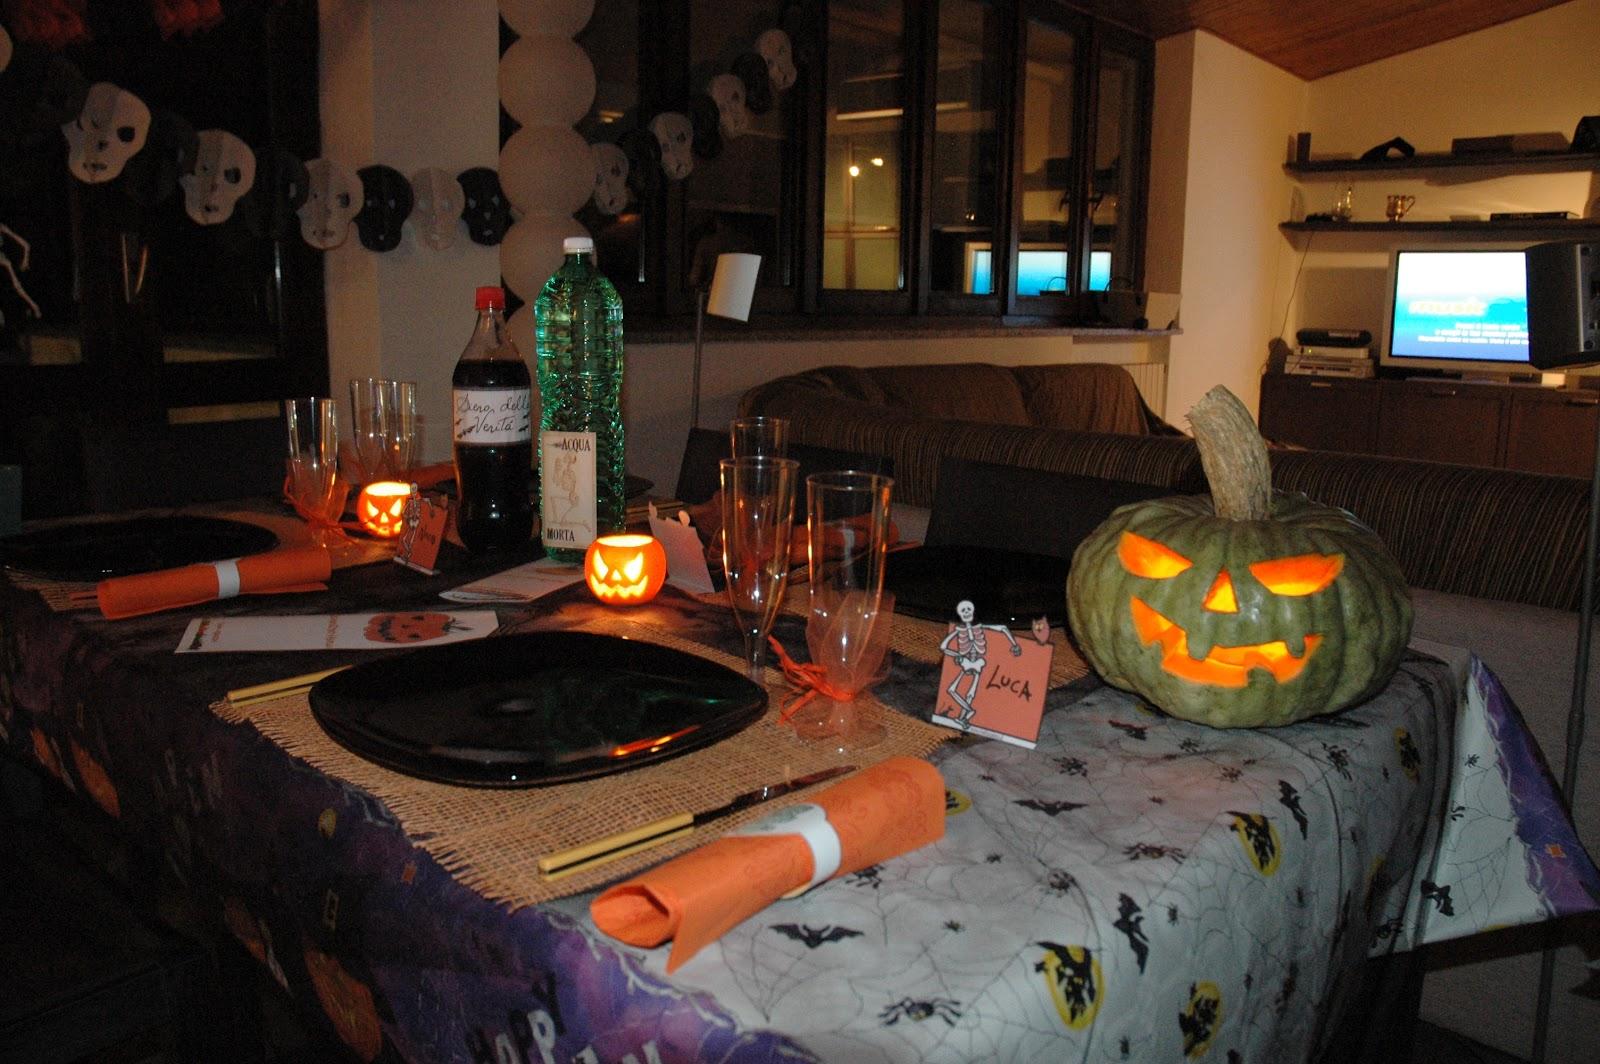 Nina 39 s diary halloween decorazioni da incubo for Decorazioni halloween